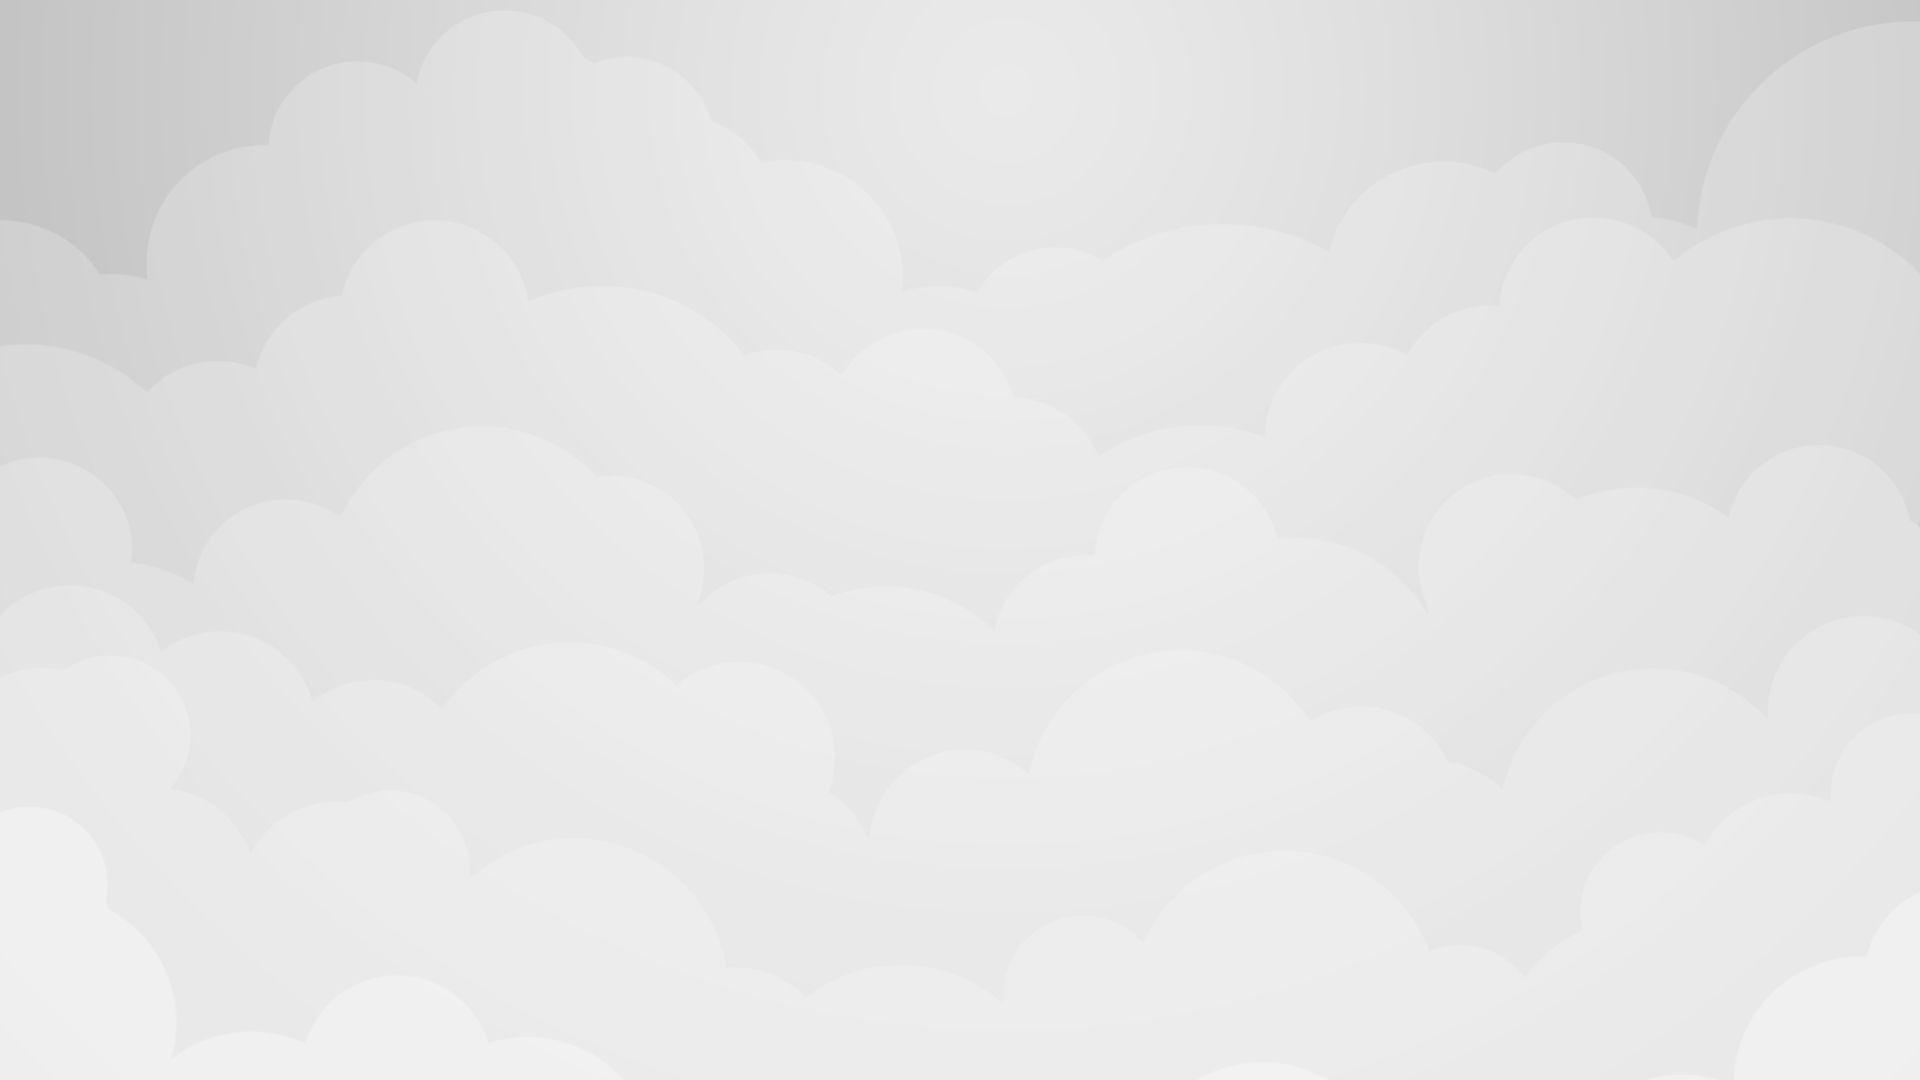 Hd wallpaper white background - White Backgrounds Find Best Latest White Backgrounds In Hd For Your Pc Desktop Background